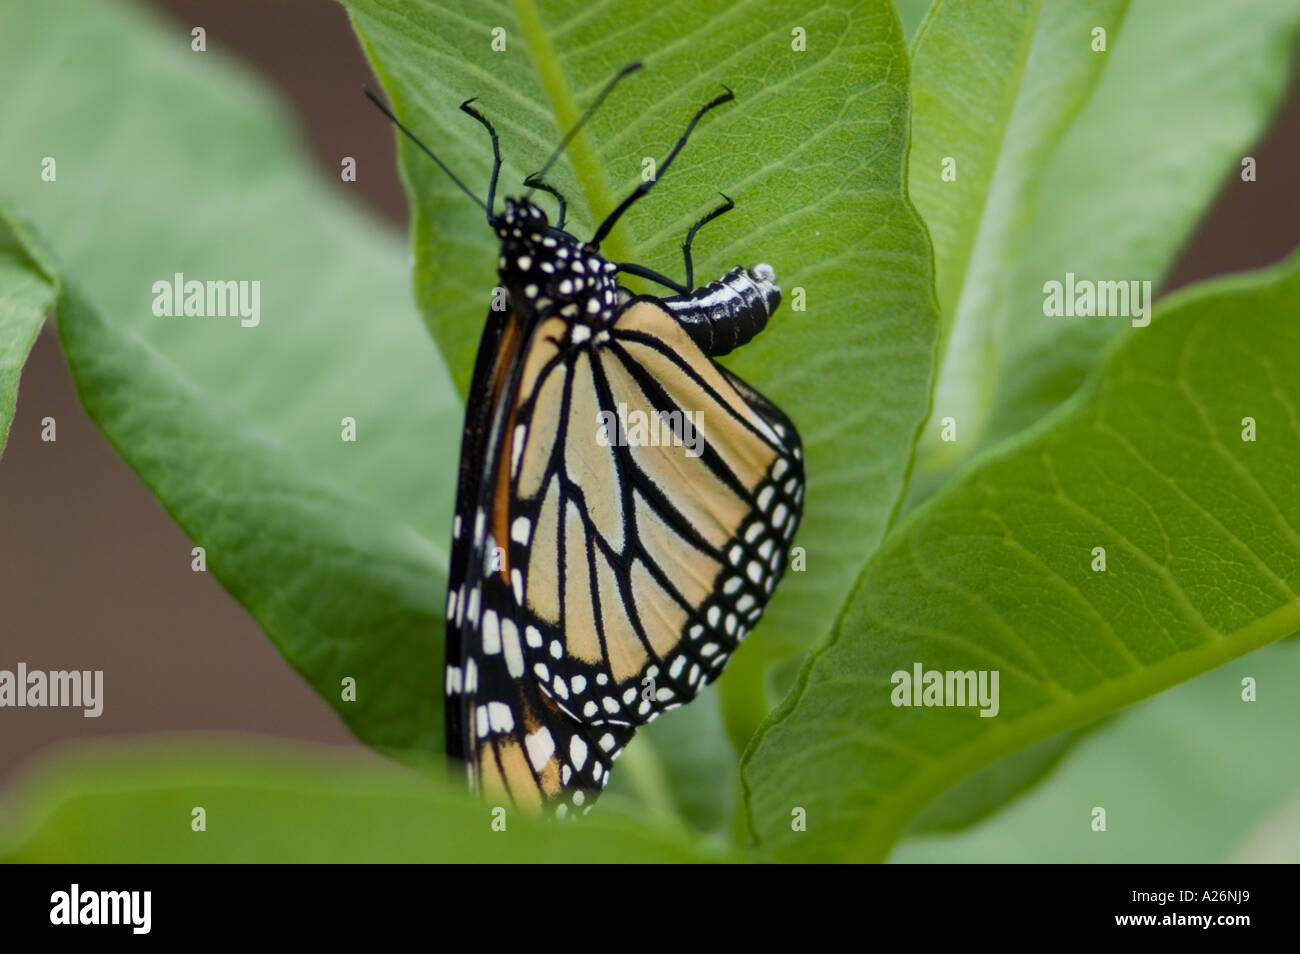 Monarch Butterfly Egg Stockfotos & Monarch Butterfly Egg Bilder - Alamy